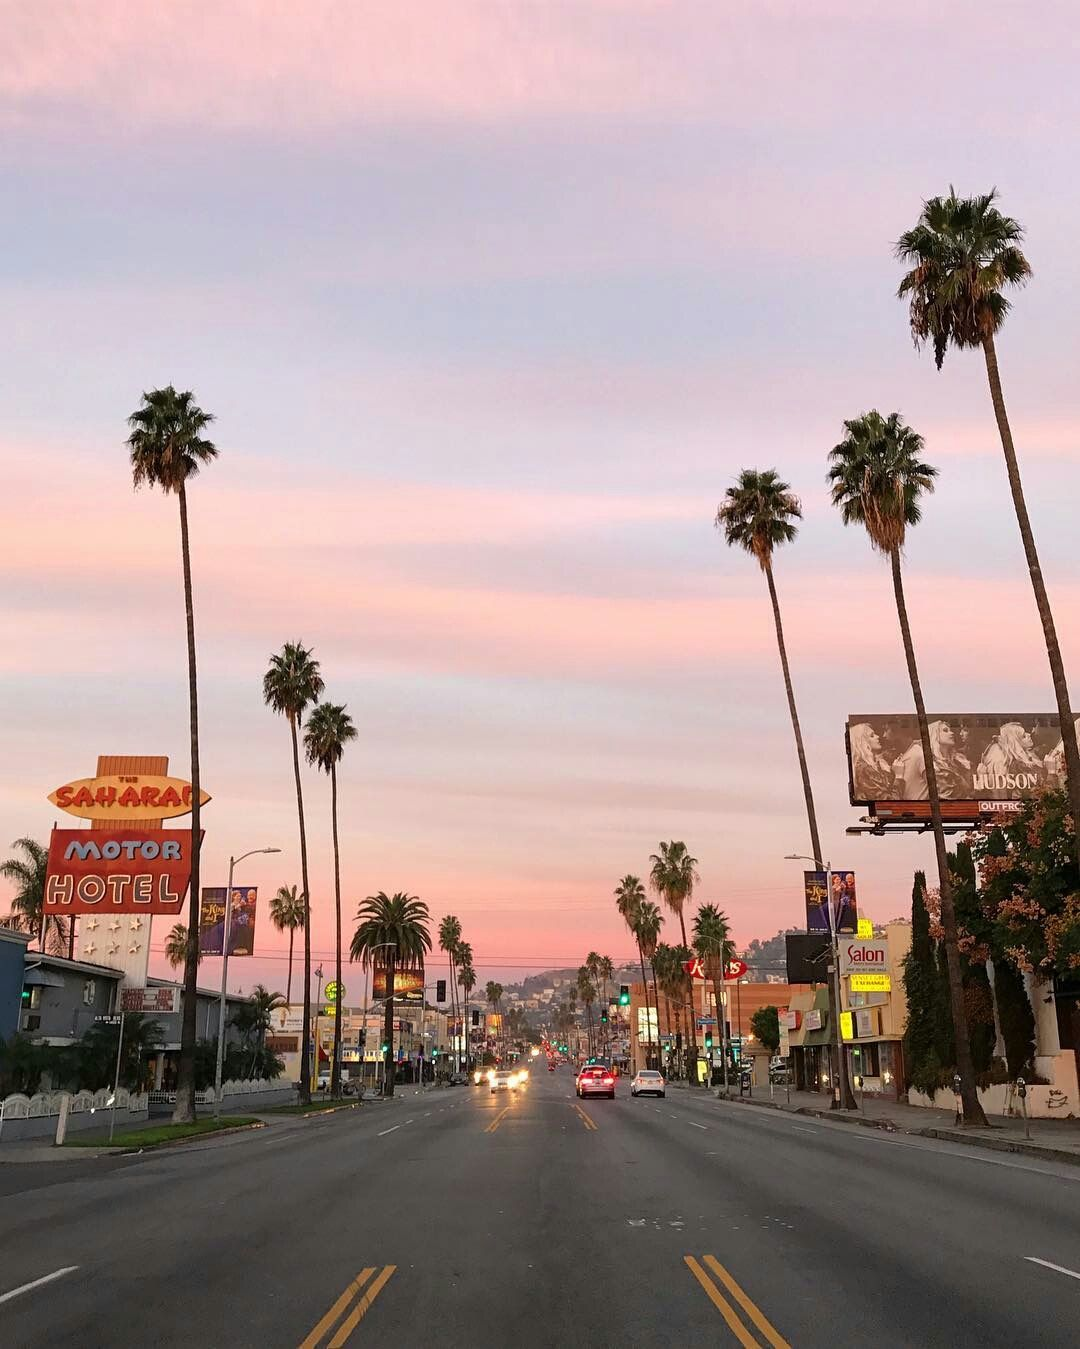 Wallpaper Los Angeles: W A N D E R L U S T